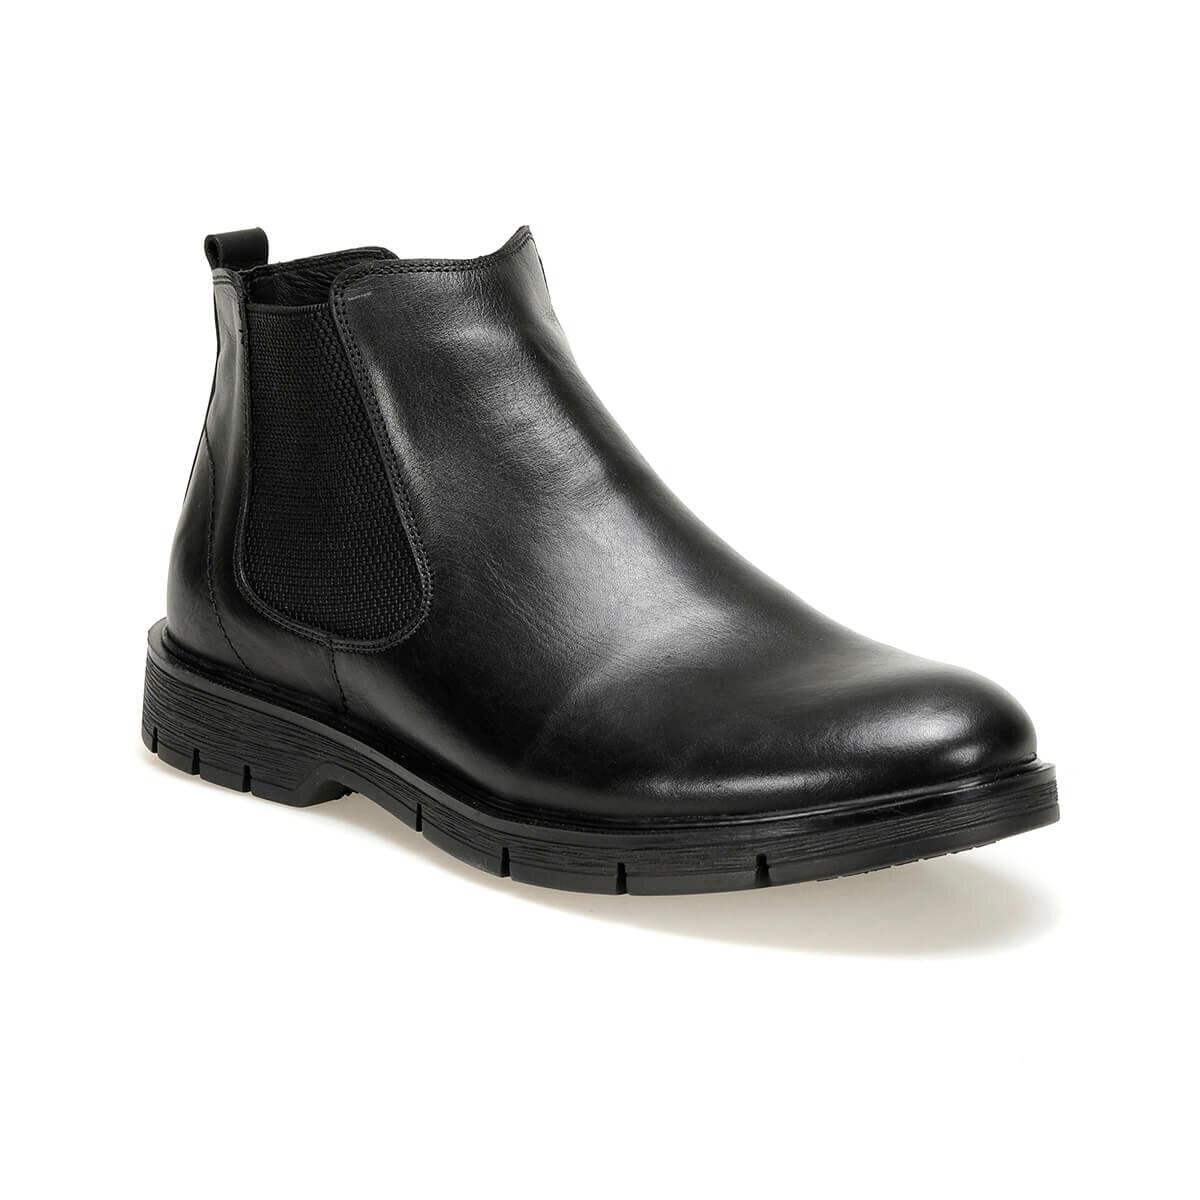 FLO 2025 botas negras Garamond